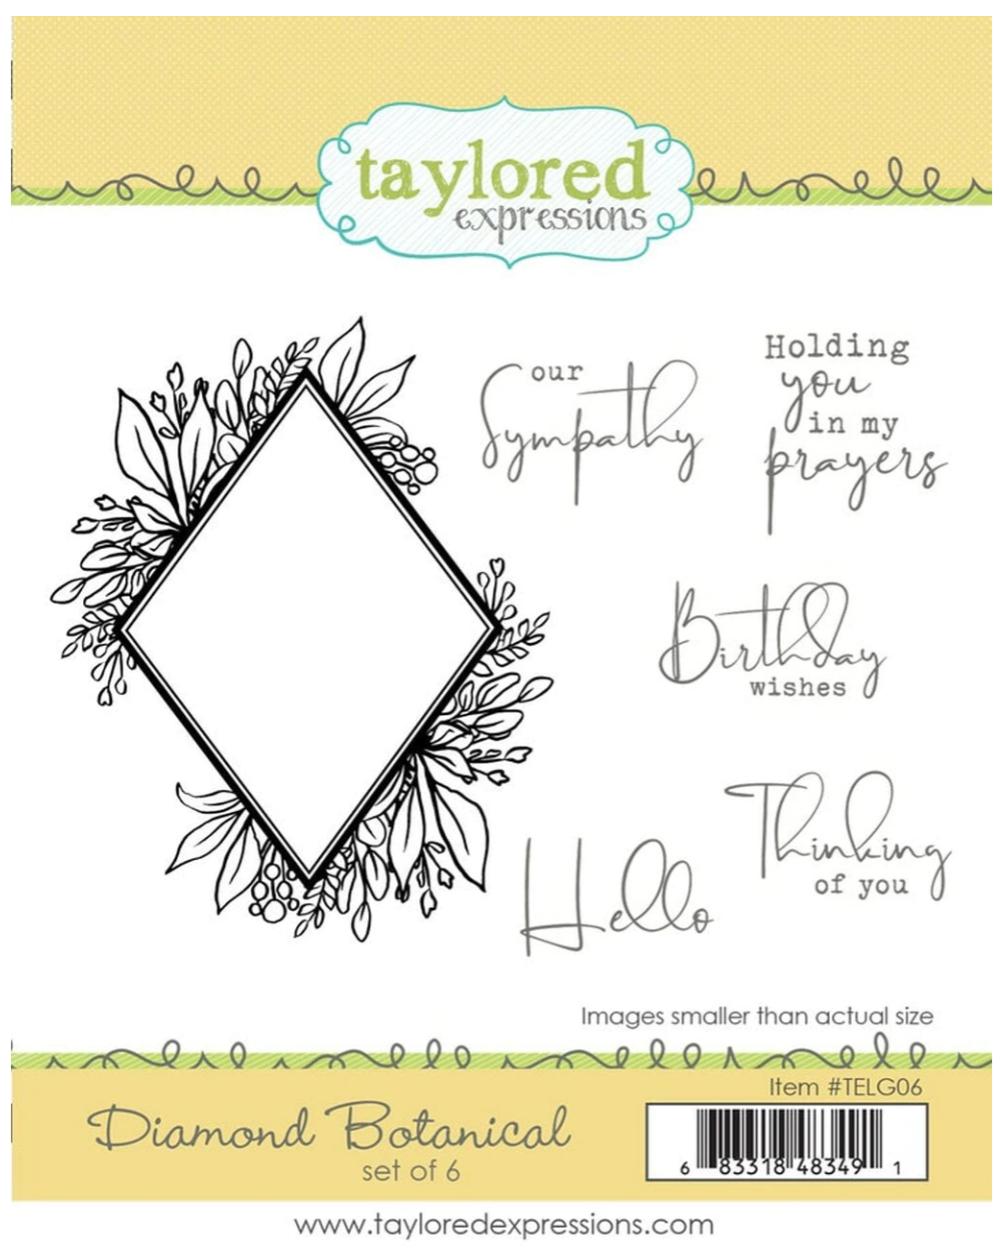 TE Diamod Botanical Stamp